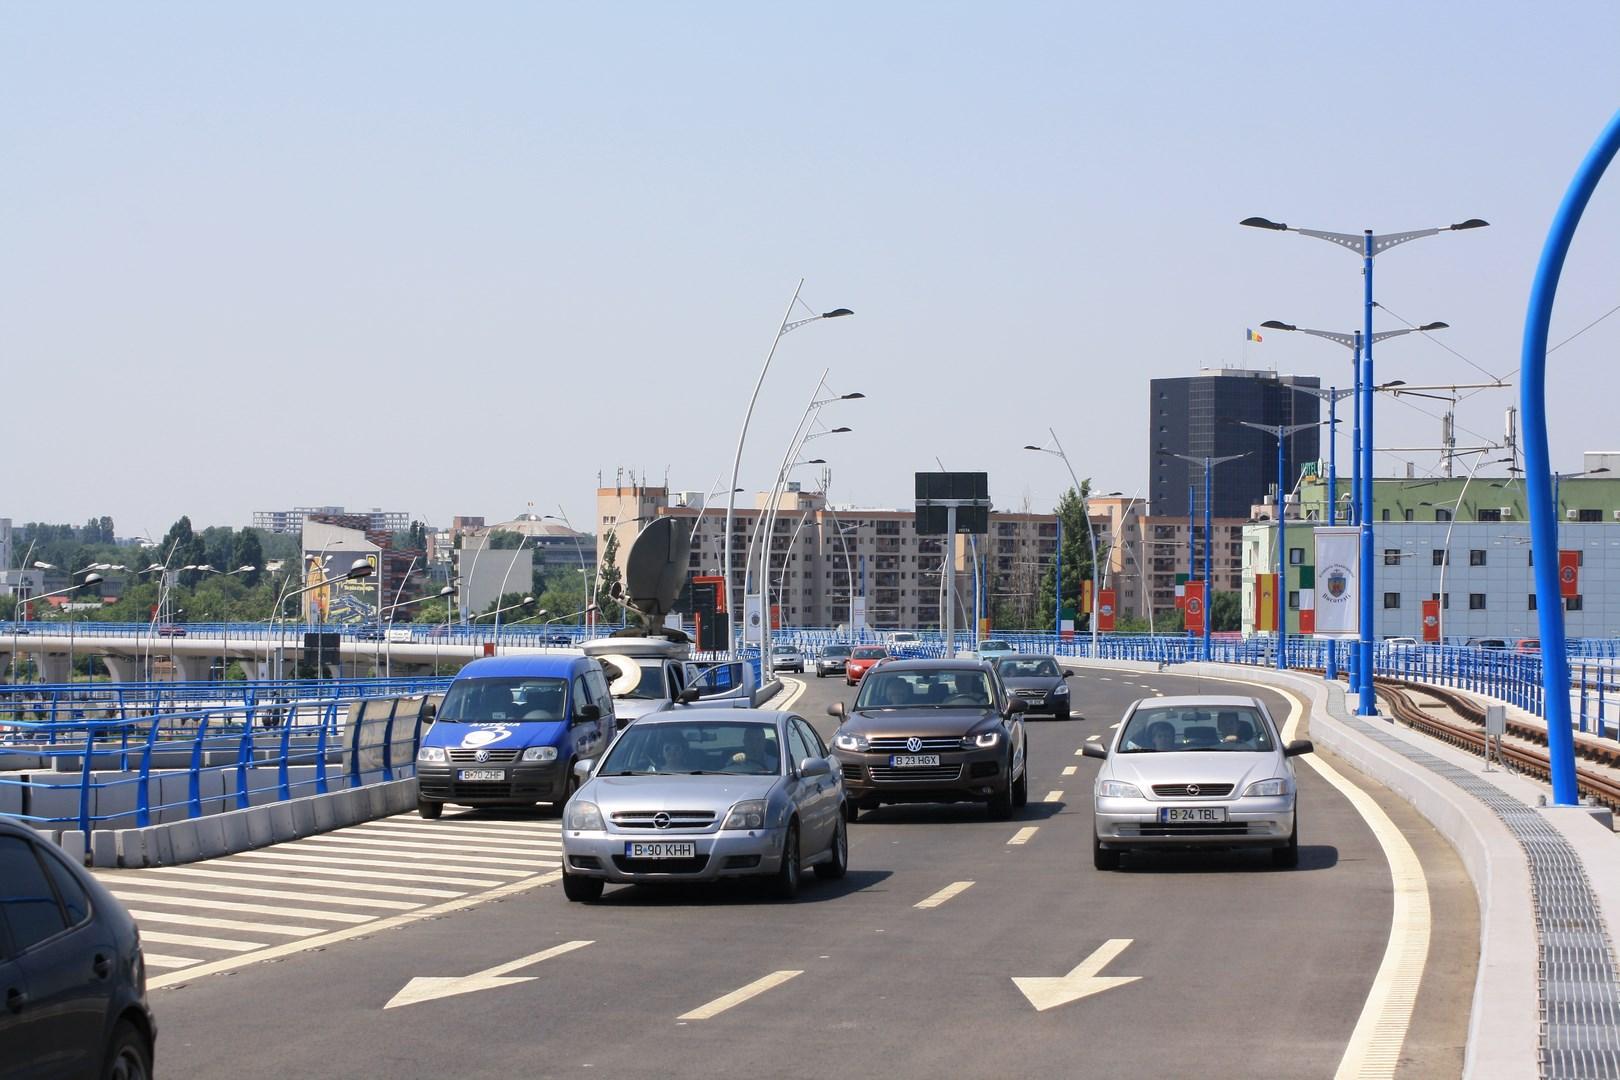 Viaducto Basarab tráfico rodado